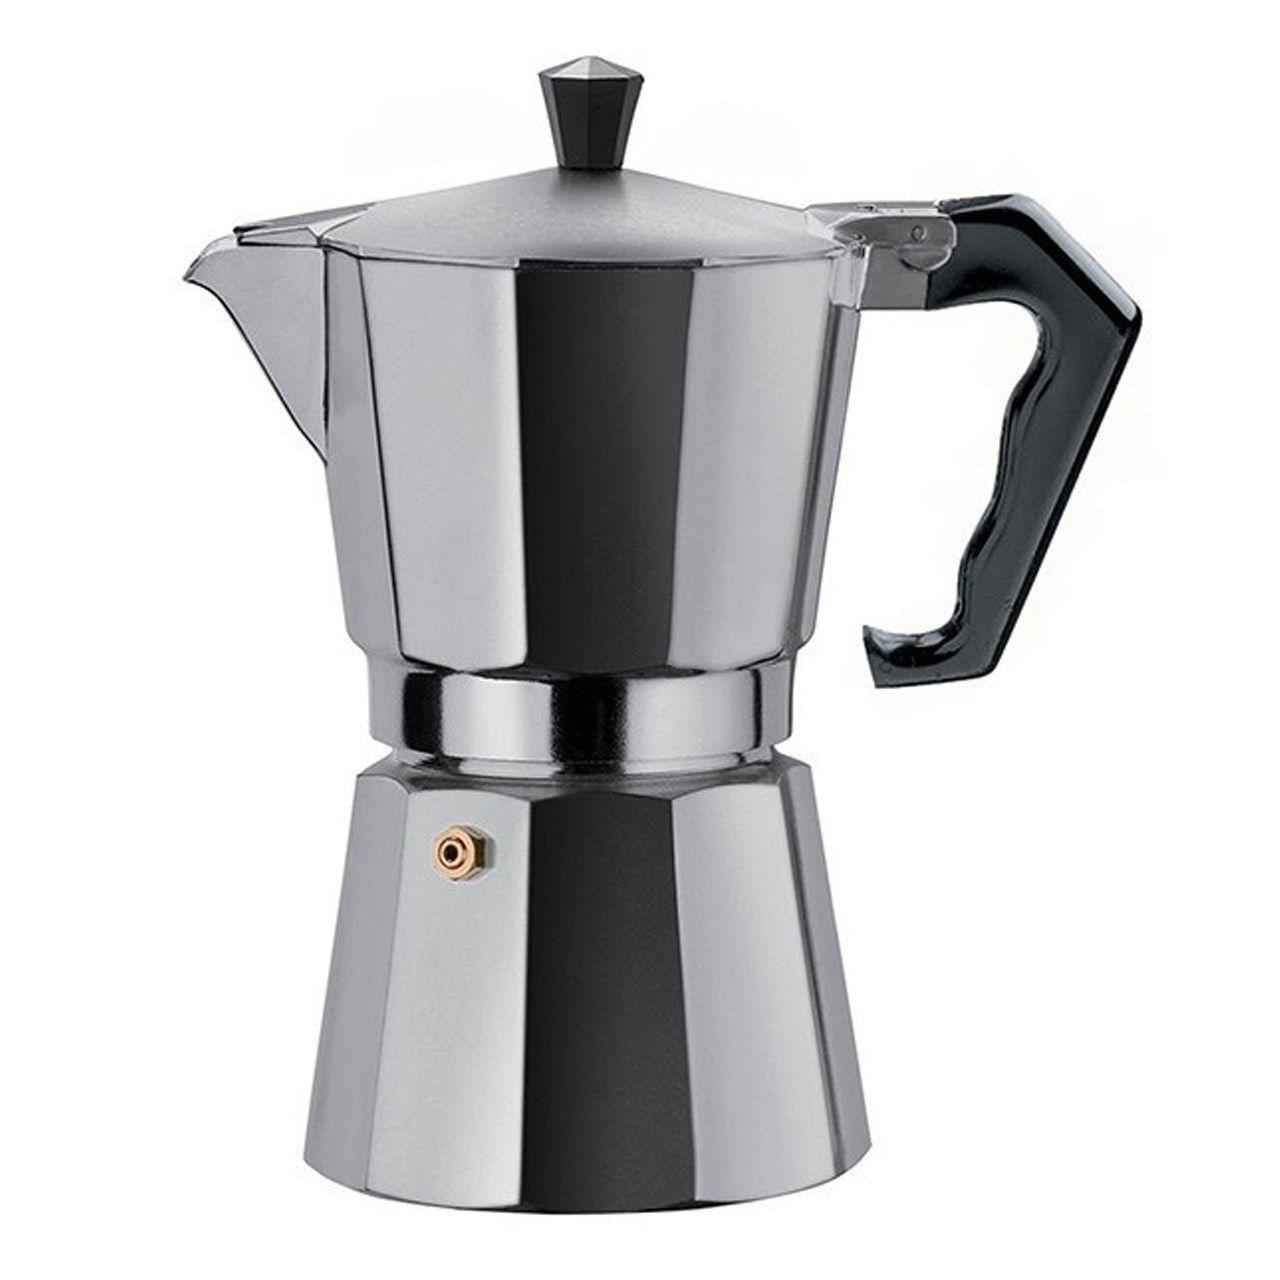 قهوه جوش موکا مدل Coffettiera 6 Cups